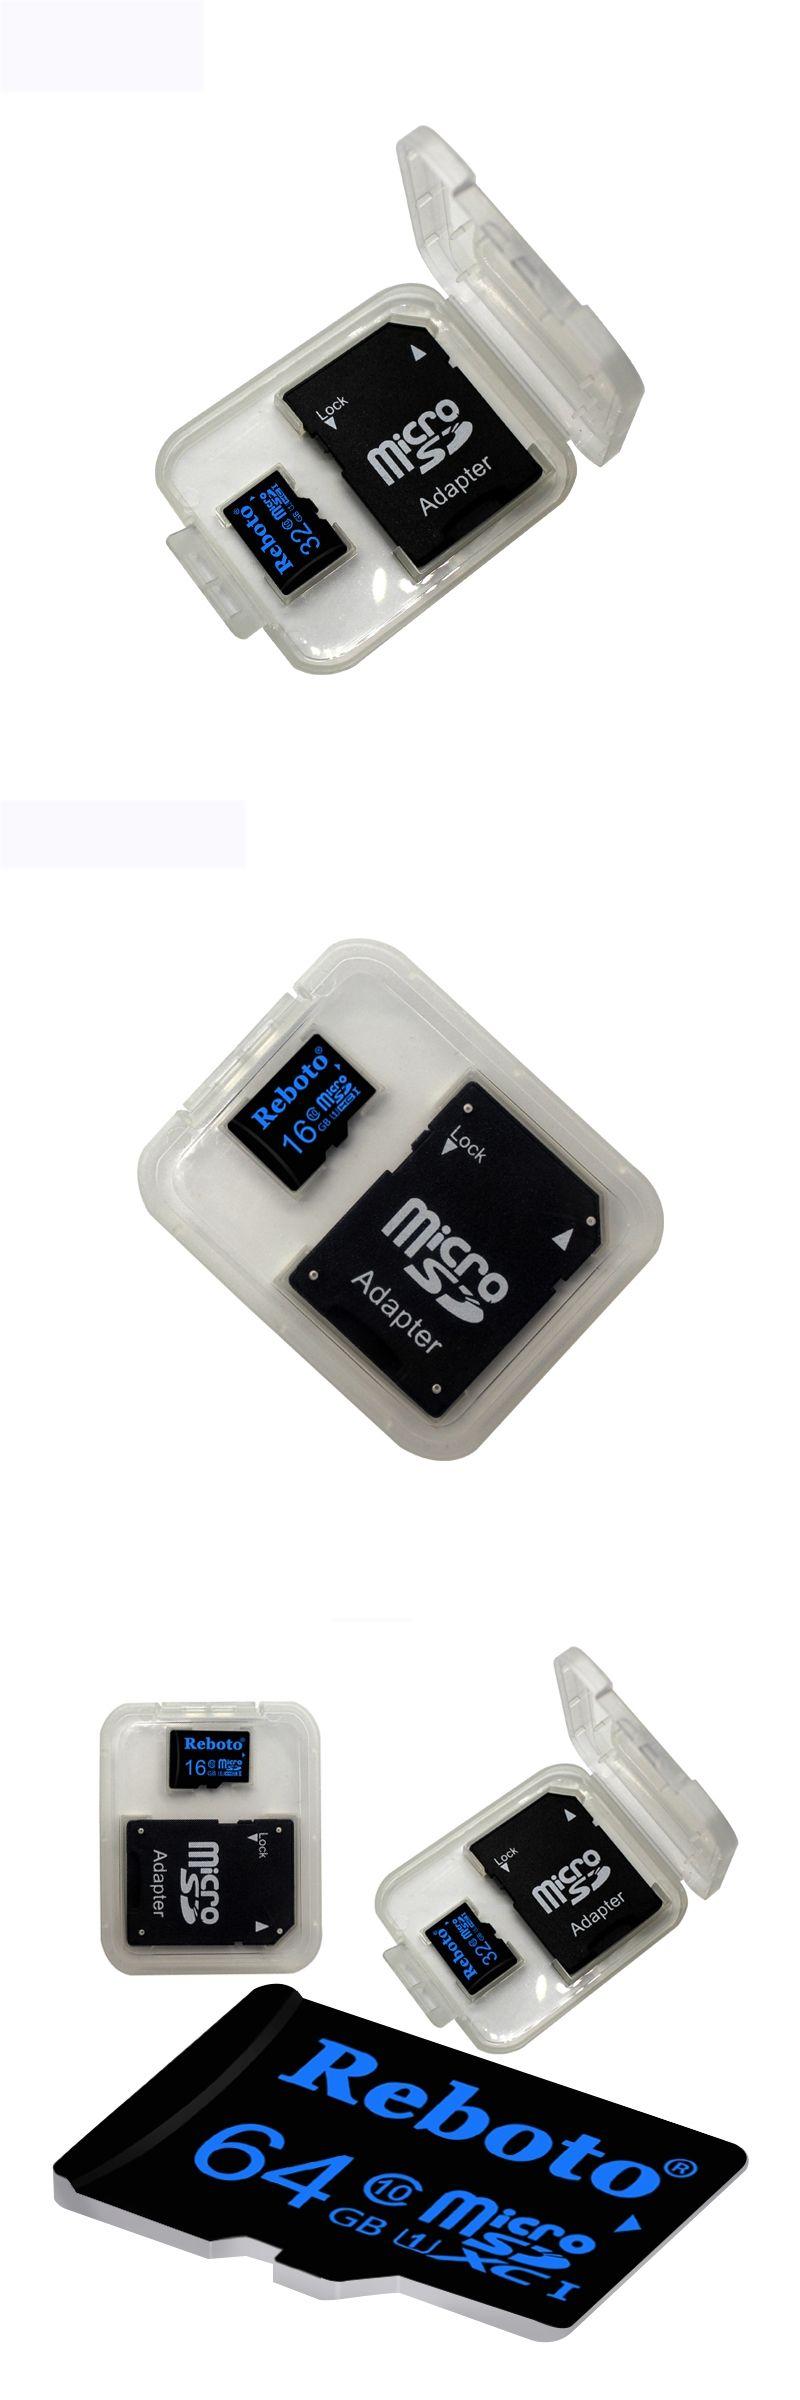 Class10 Flash Memory Card Microsd Mini Tf 8gb 6gb 32gb 64gb Sandisk Ultra Uhs 1 Class 10 Micro Sd 48 Mb S Sdsqunb Black